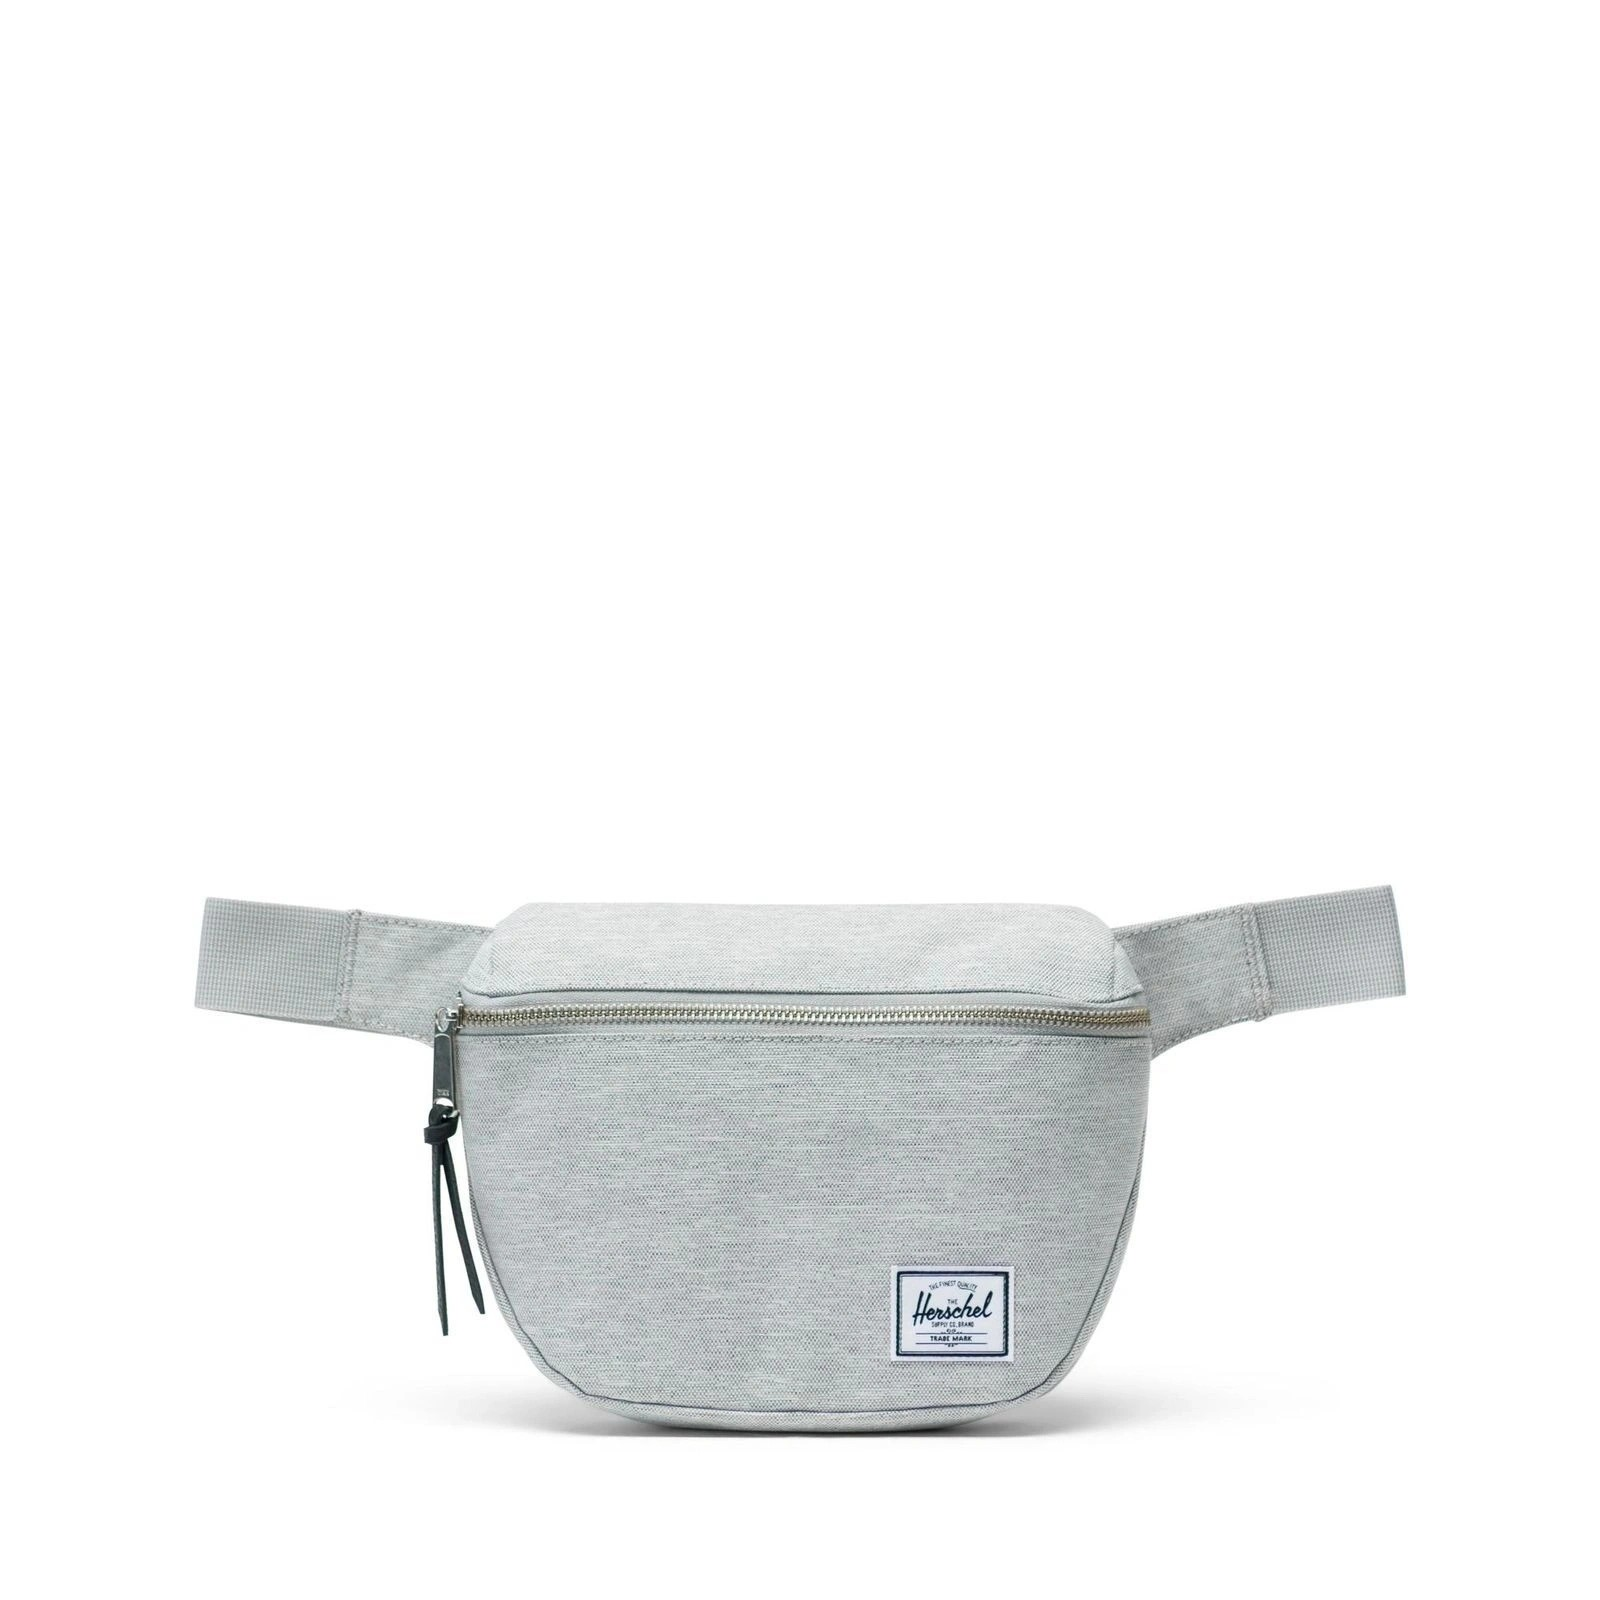 Herschel Bel Çantası Fifteen Light Grey Crosshatch